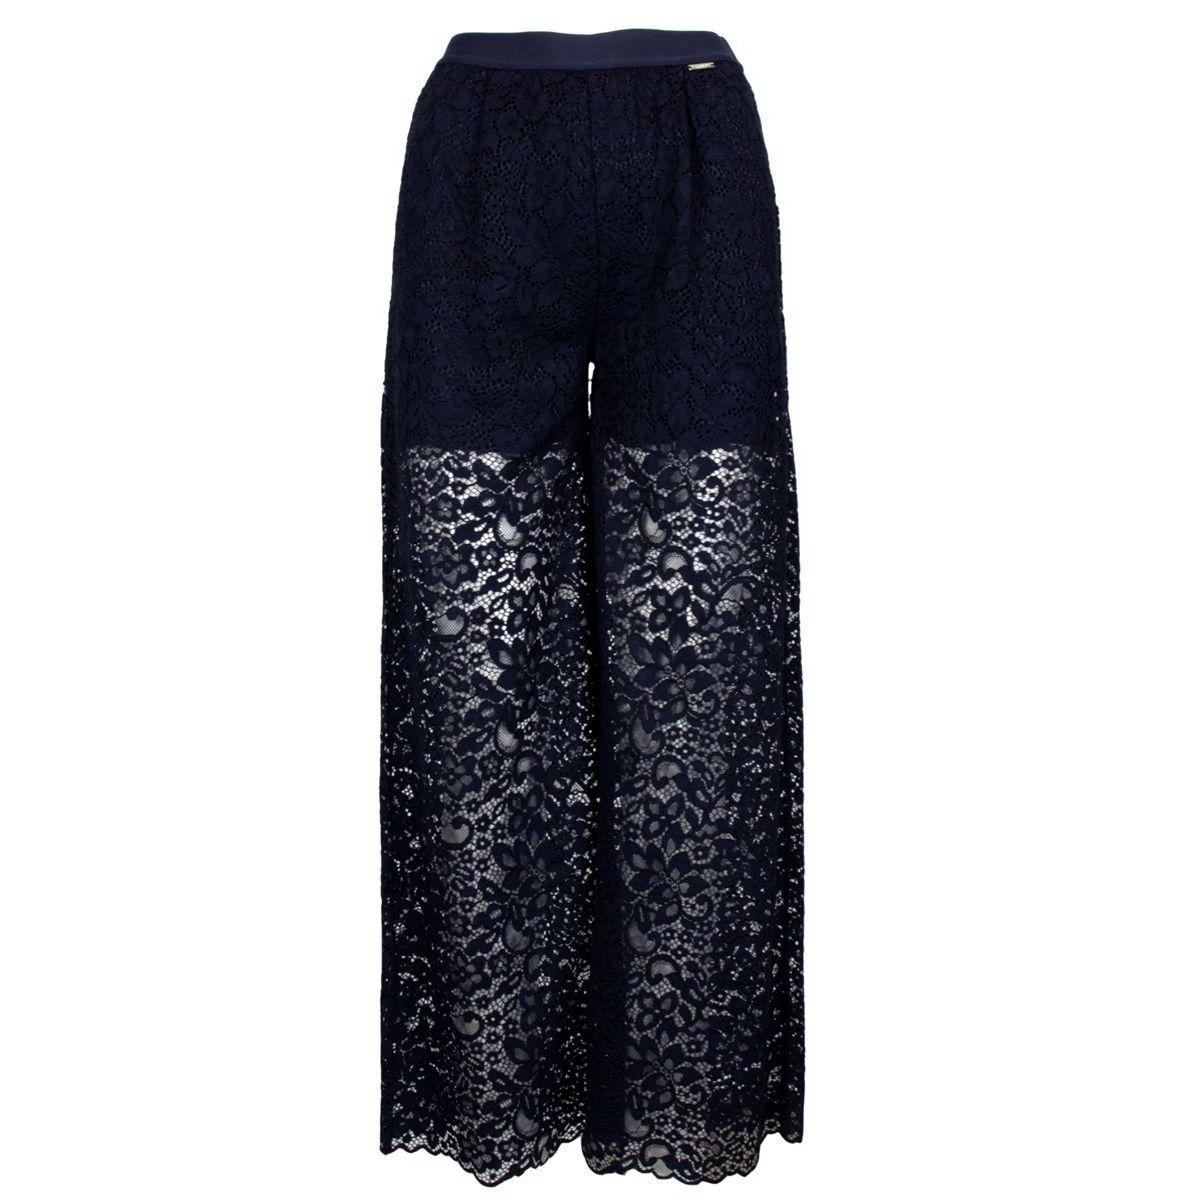 Lace trousers with elastic waistband Night blue Liu Jo